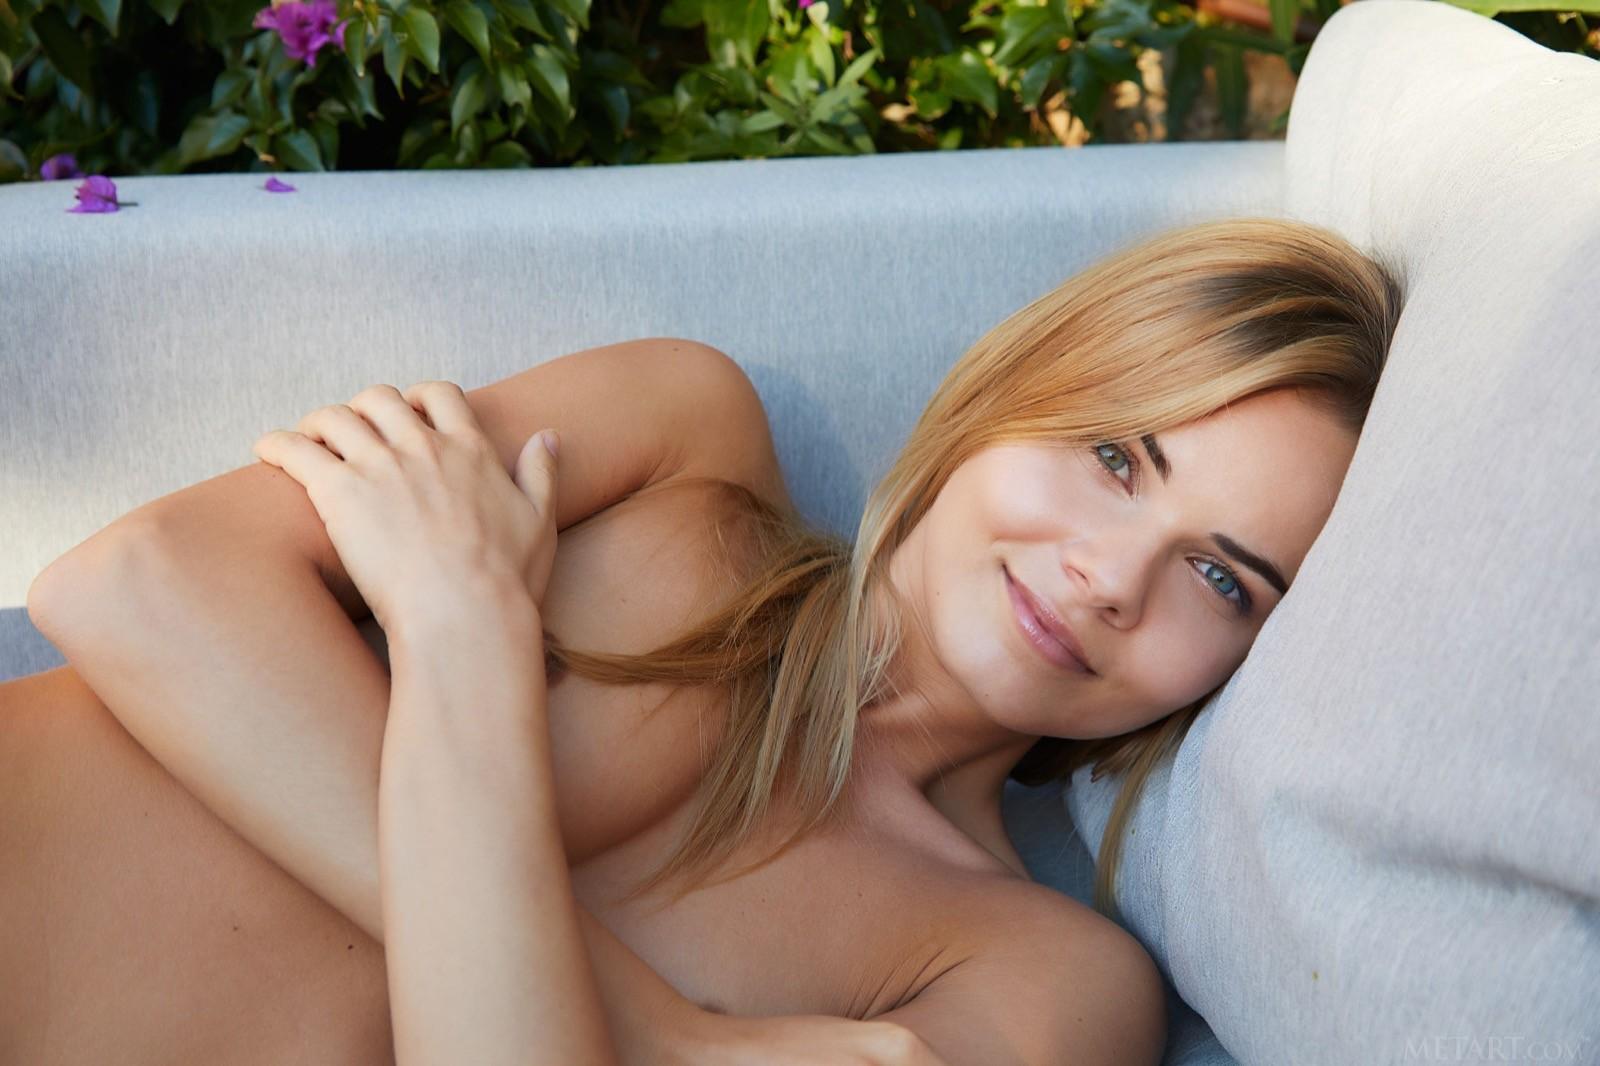 Голая милашка позирует на диванчике - фото